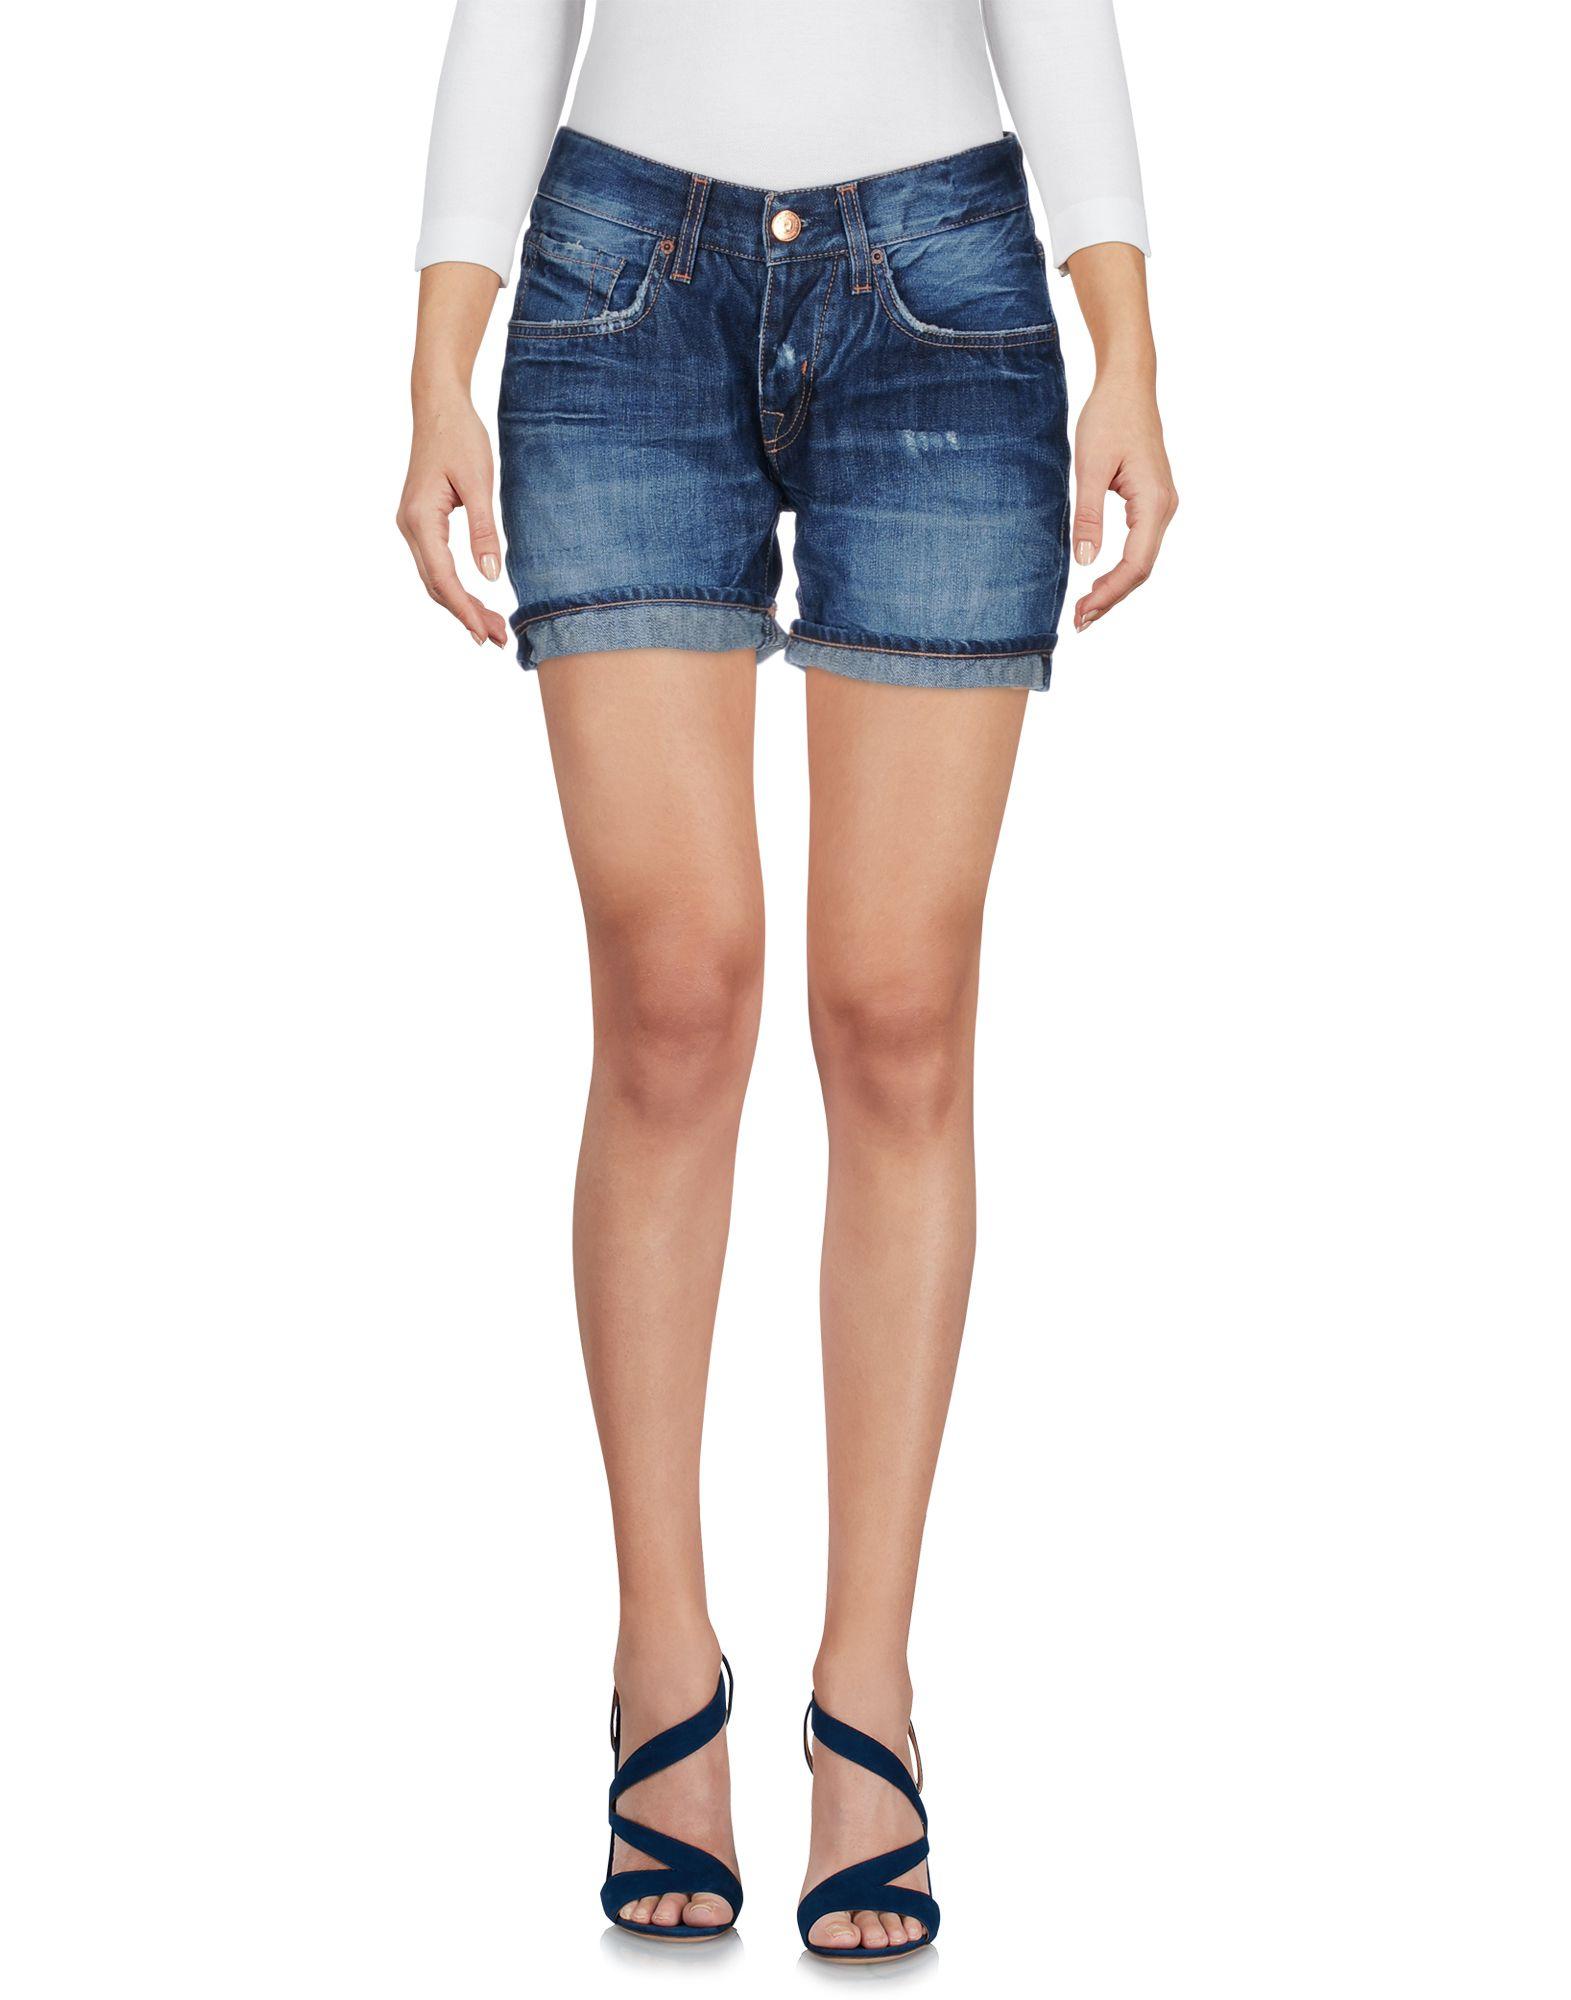 2W2M Джинсовые шорты 2w2m джинсовые шорты